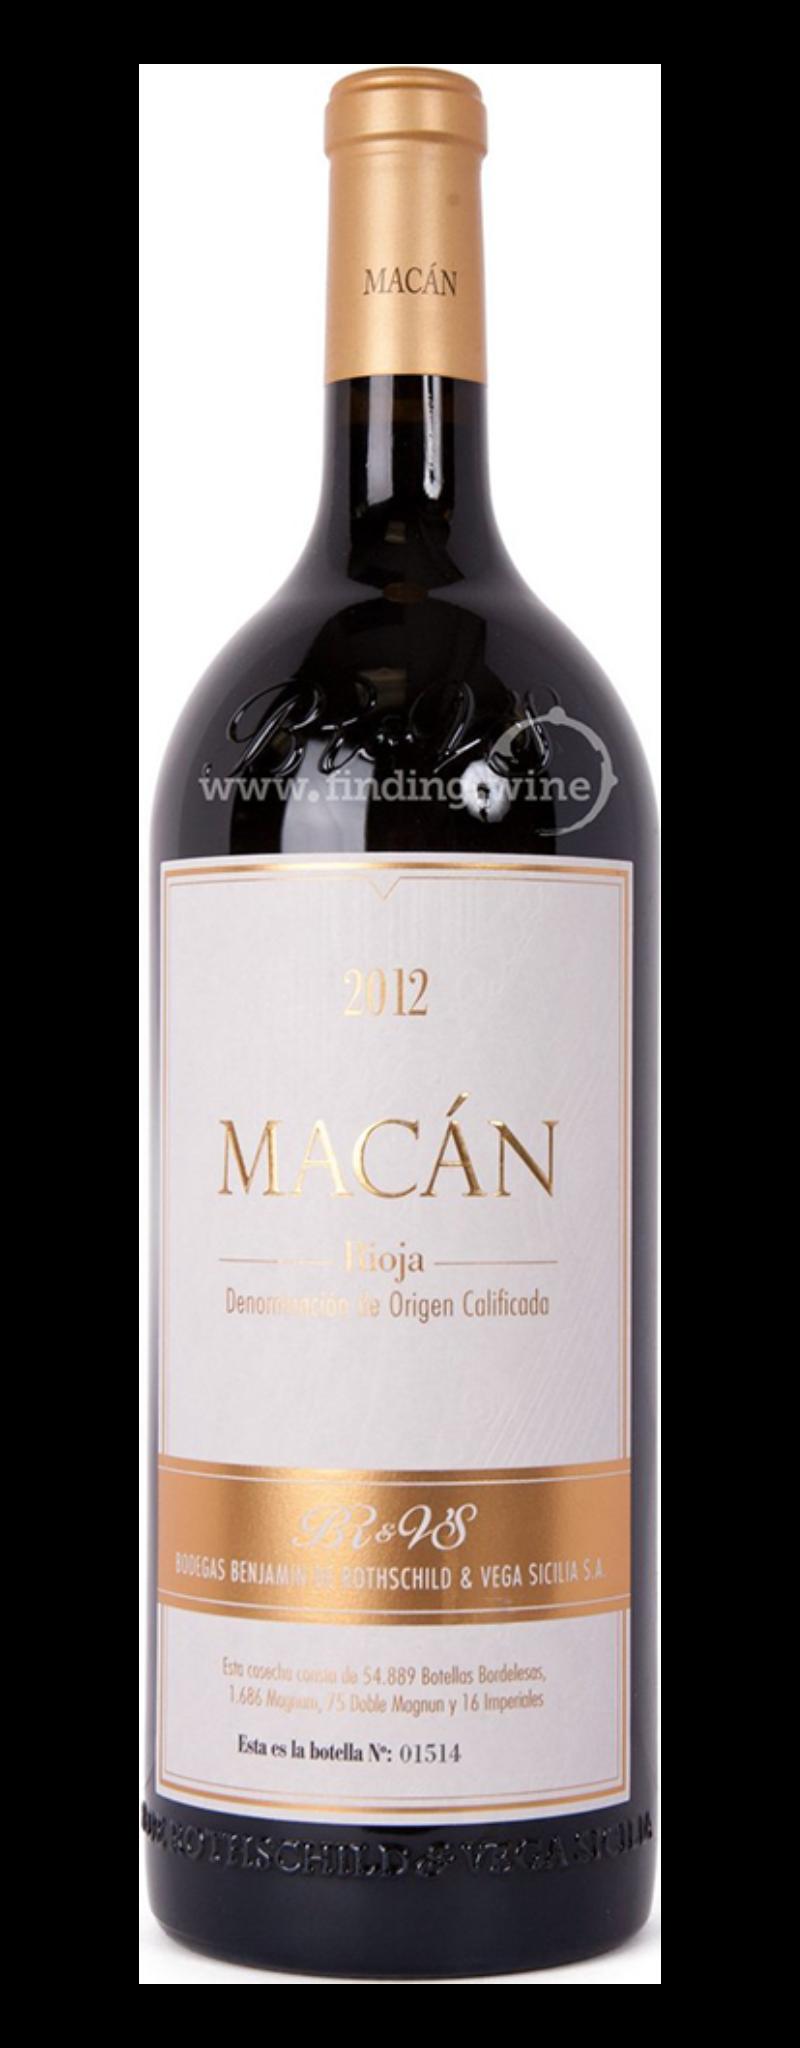 Bodegas Benjamin de Rothschild & Vega Sicilia, Macan, Rioja DOCa  - 750ml